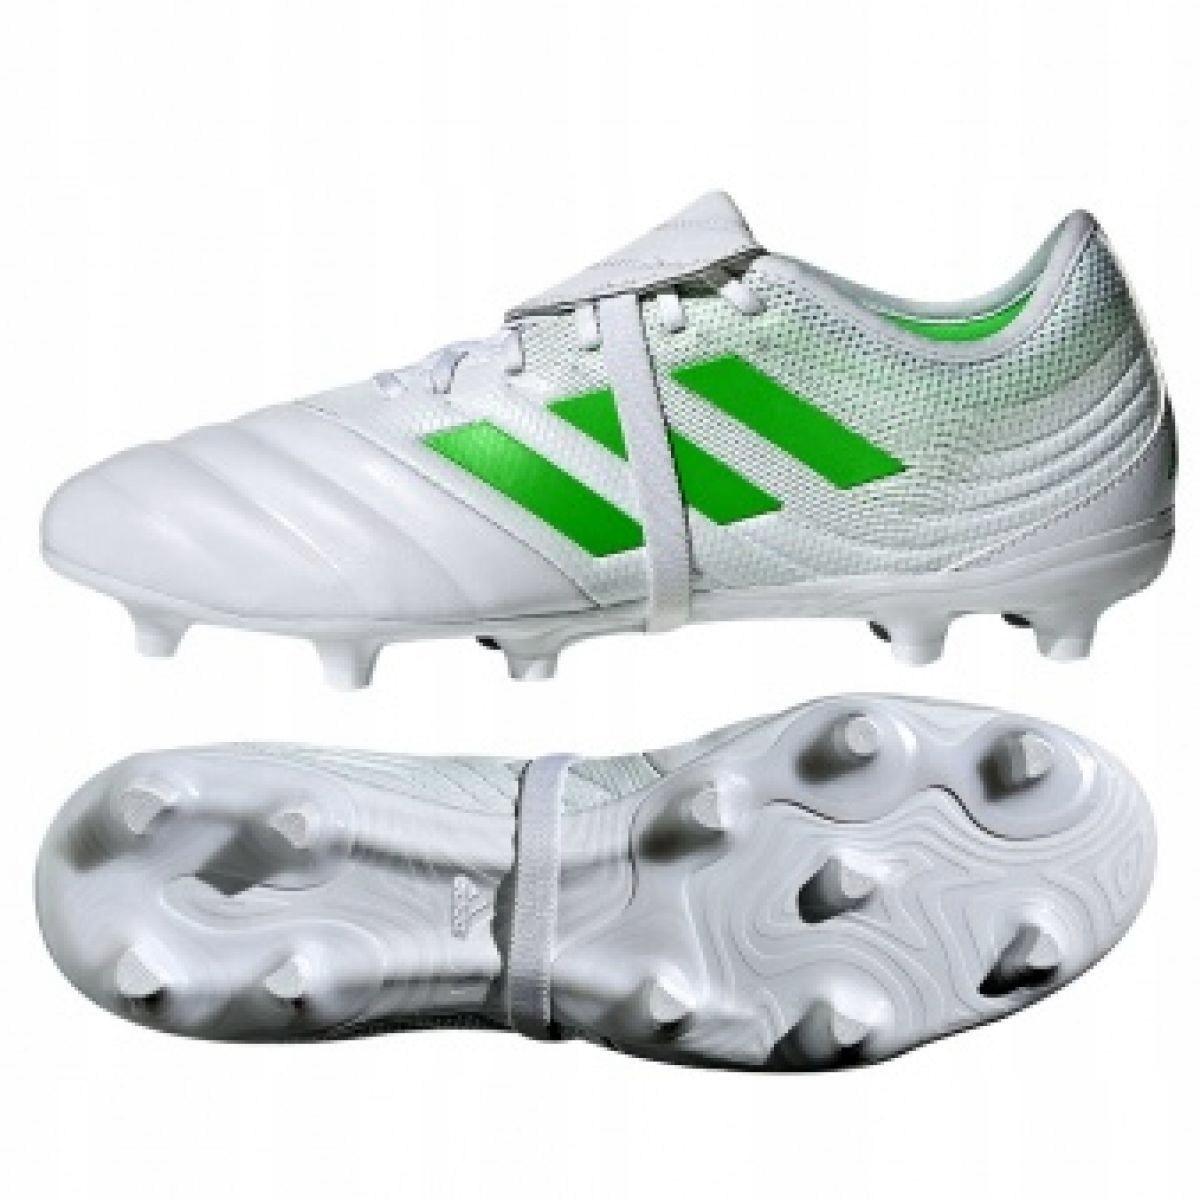 Buty piłkarskie adidas Copa Gloro 19.2 FG M